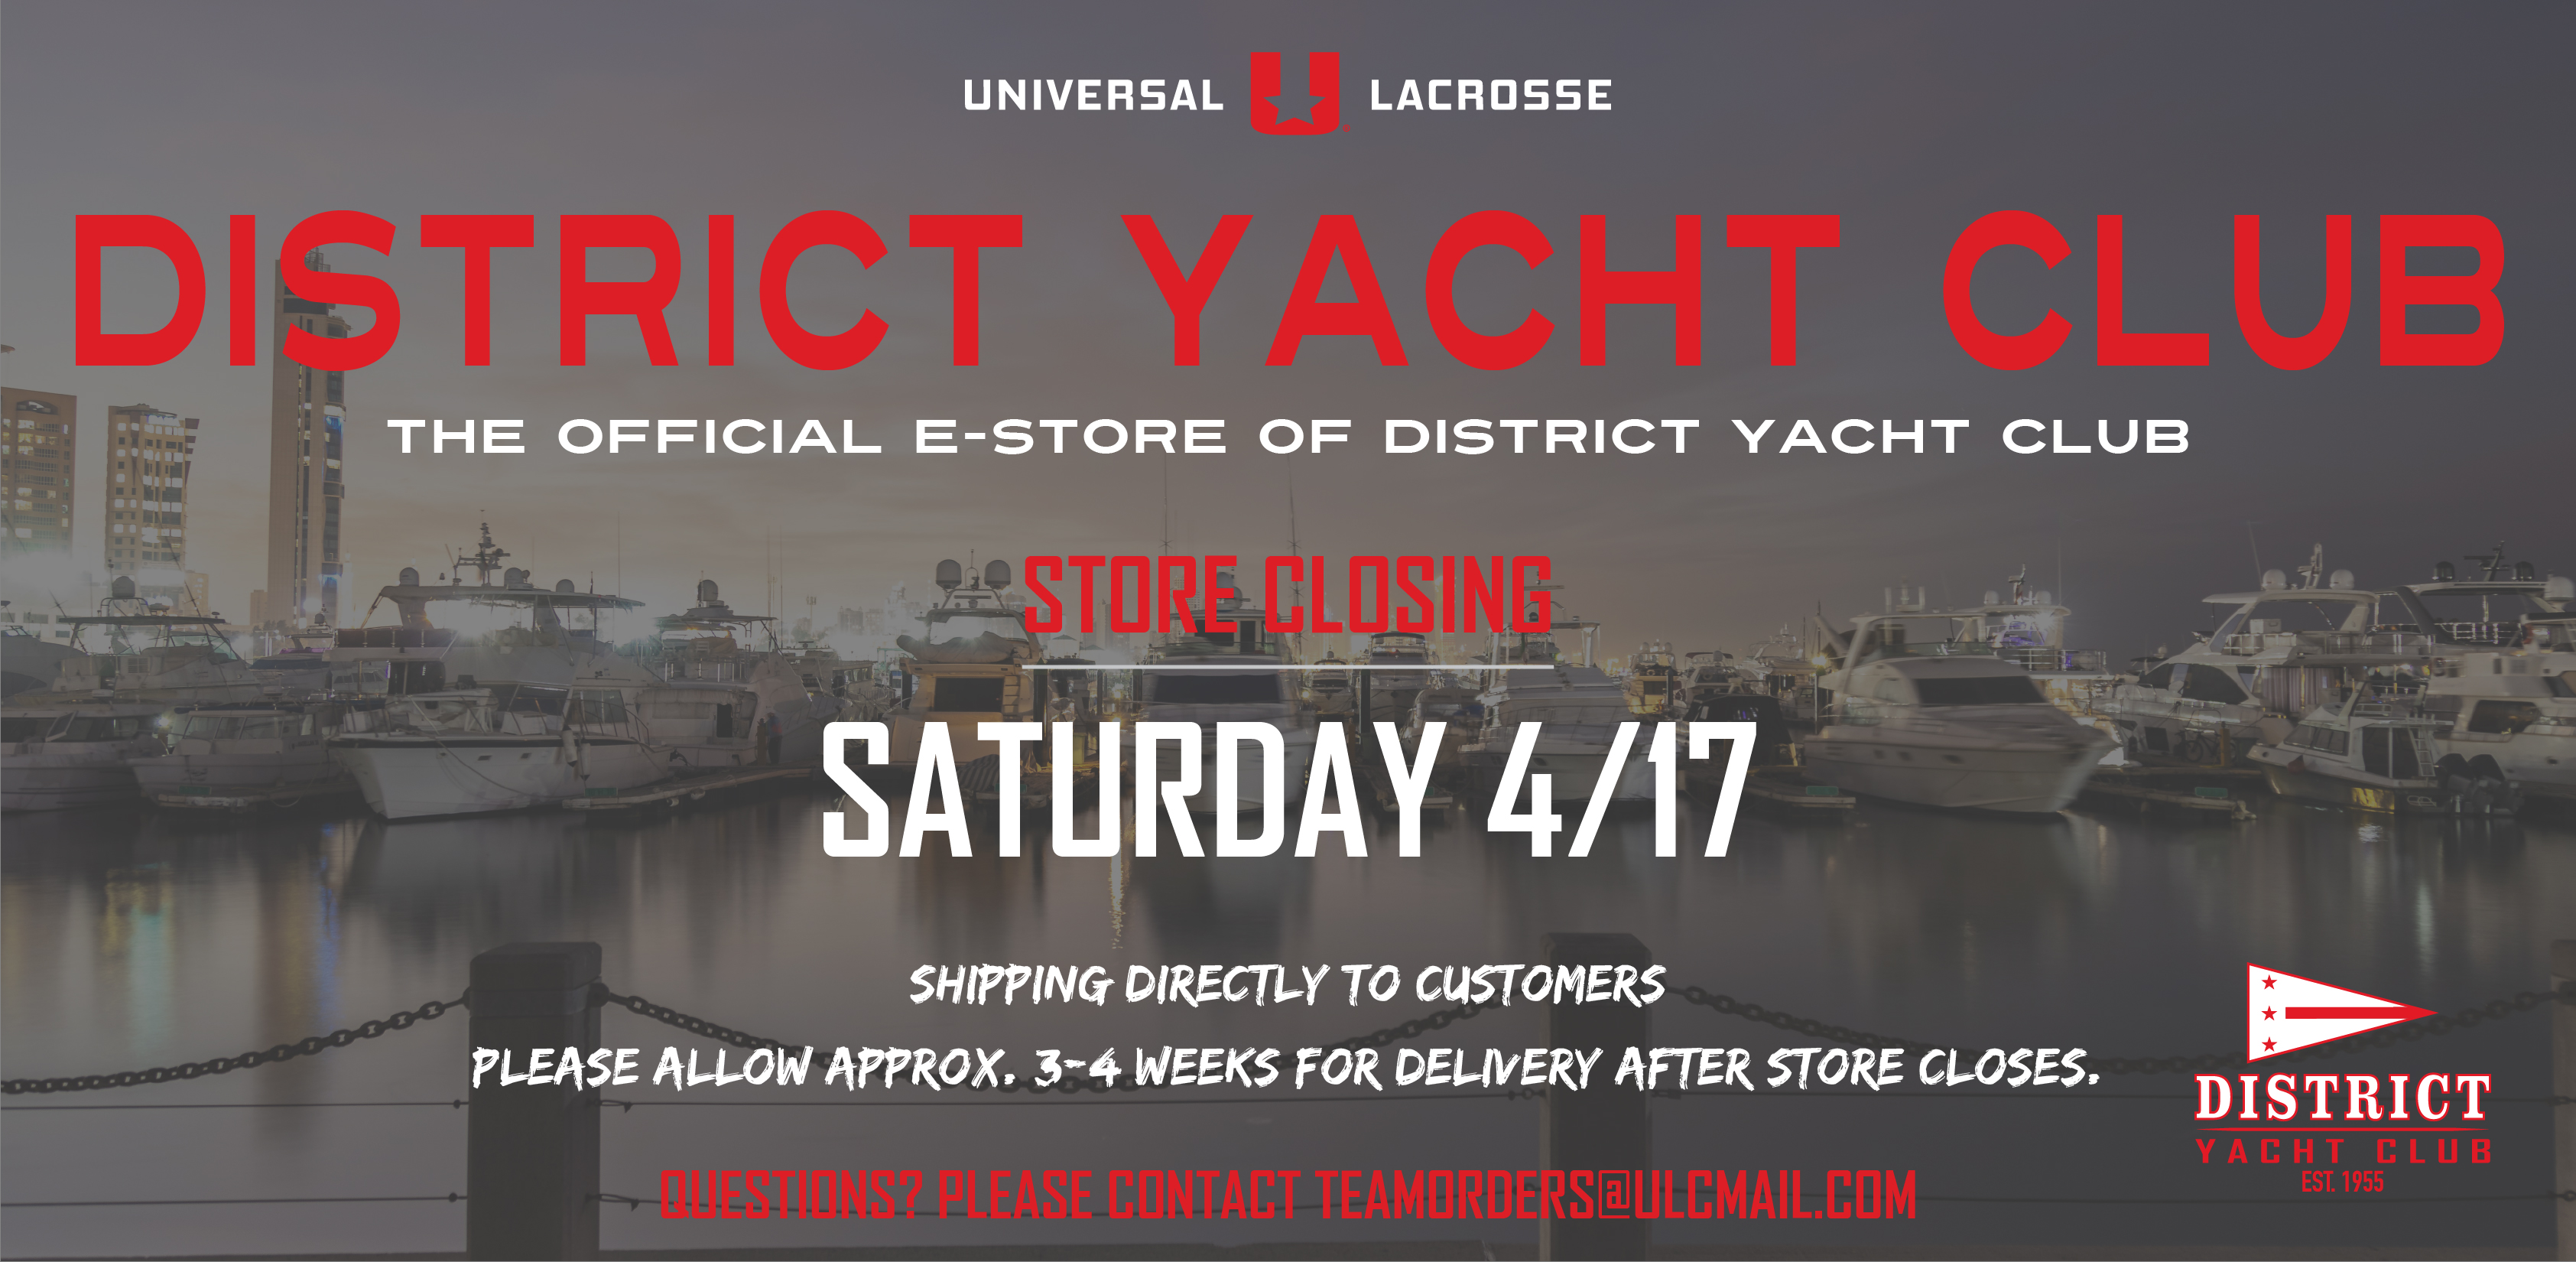 District Yacht Club